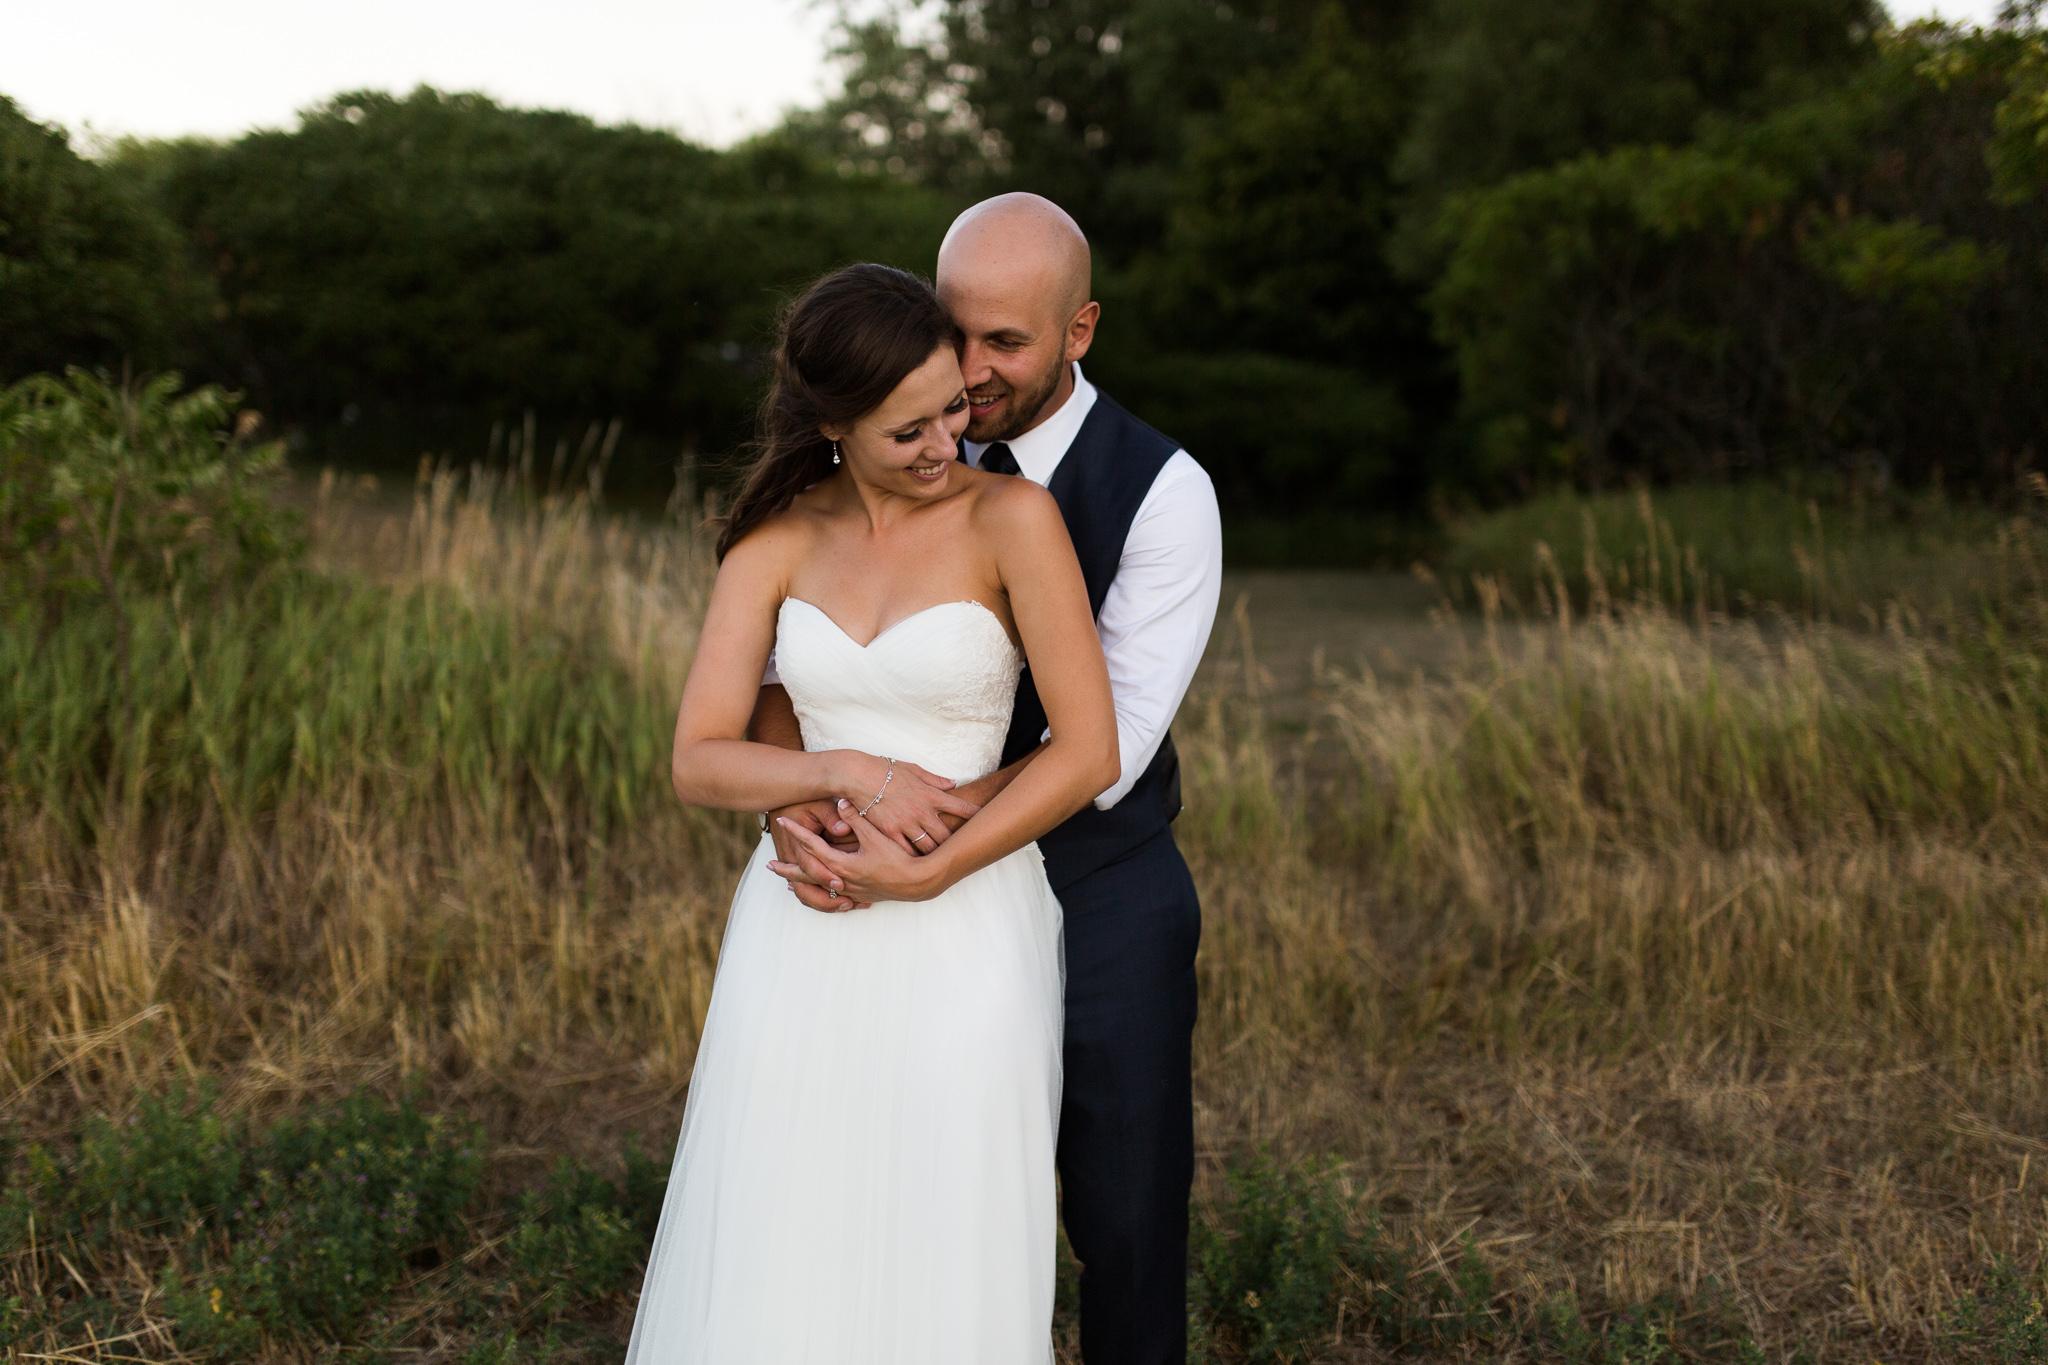 springer-house-burlington-wedding-photographer-605-of-756.jpg